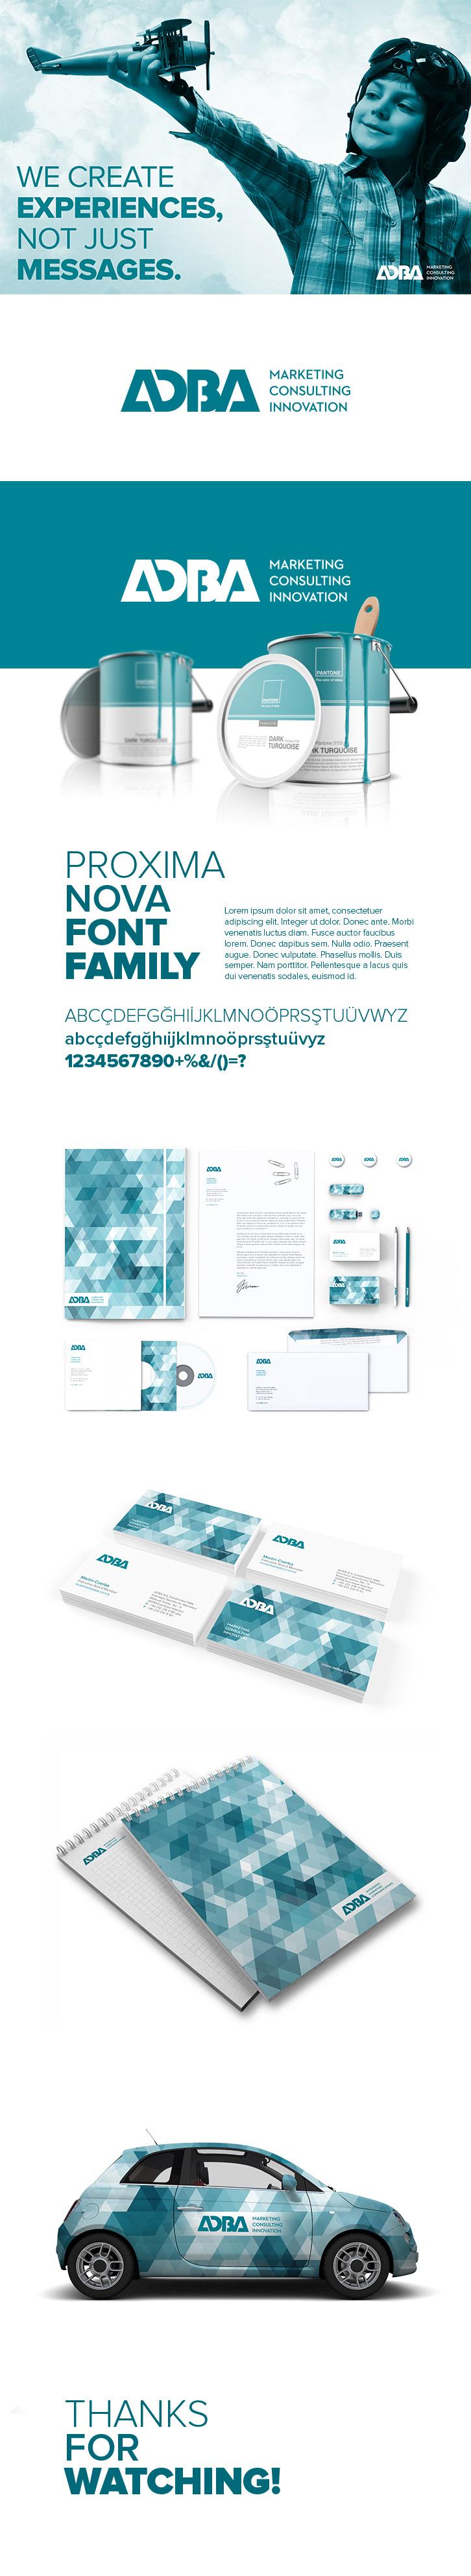 ADBA,marketing  ,Consulting,innovation,istanbul